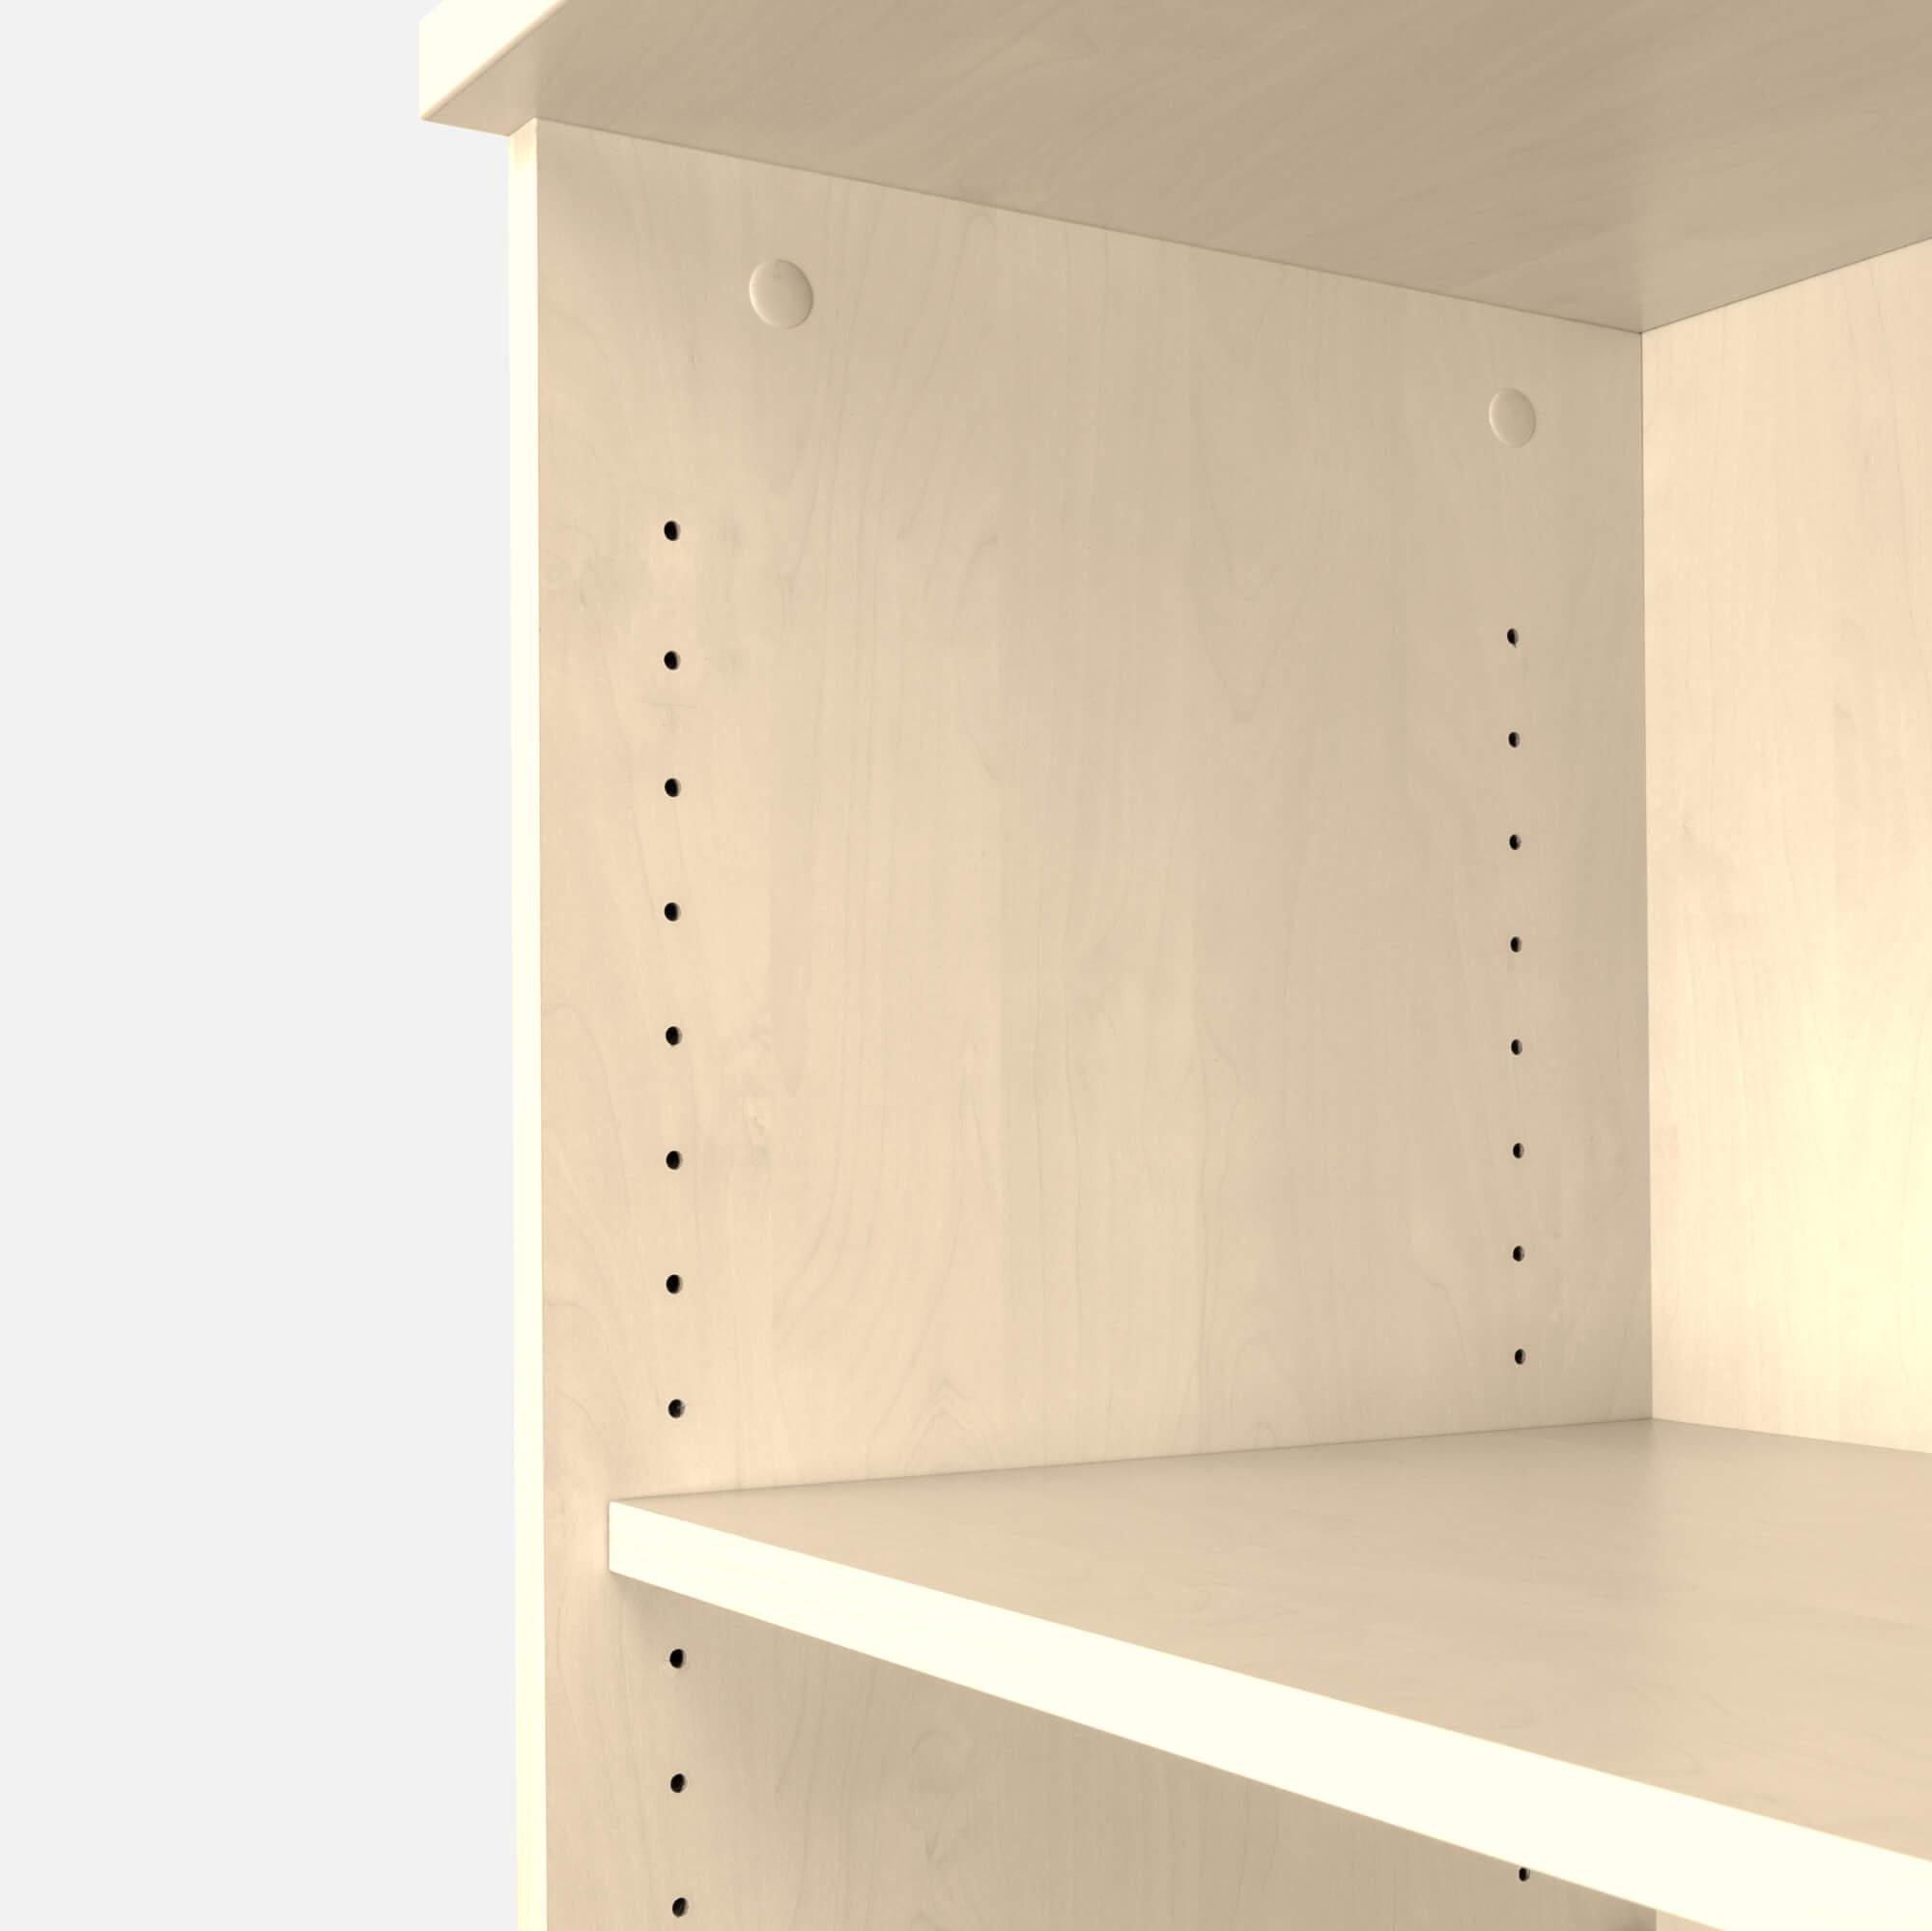 UNI Schiebetürenschrank abschließbar 1,2M Weiß-Ahorn Schrank Büroschrank Aktenschrank